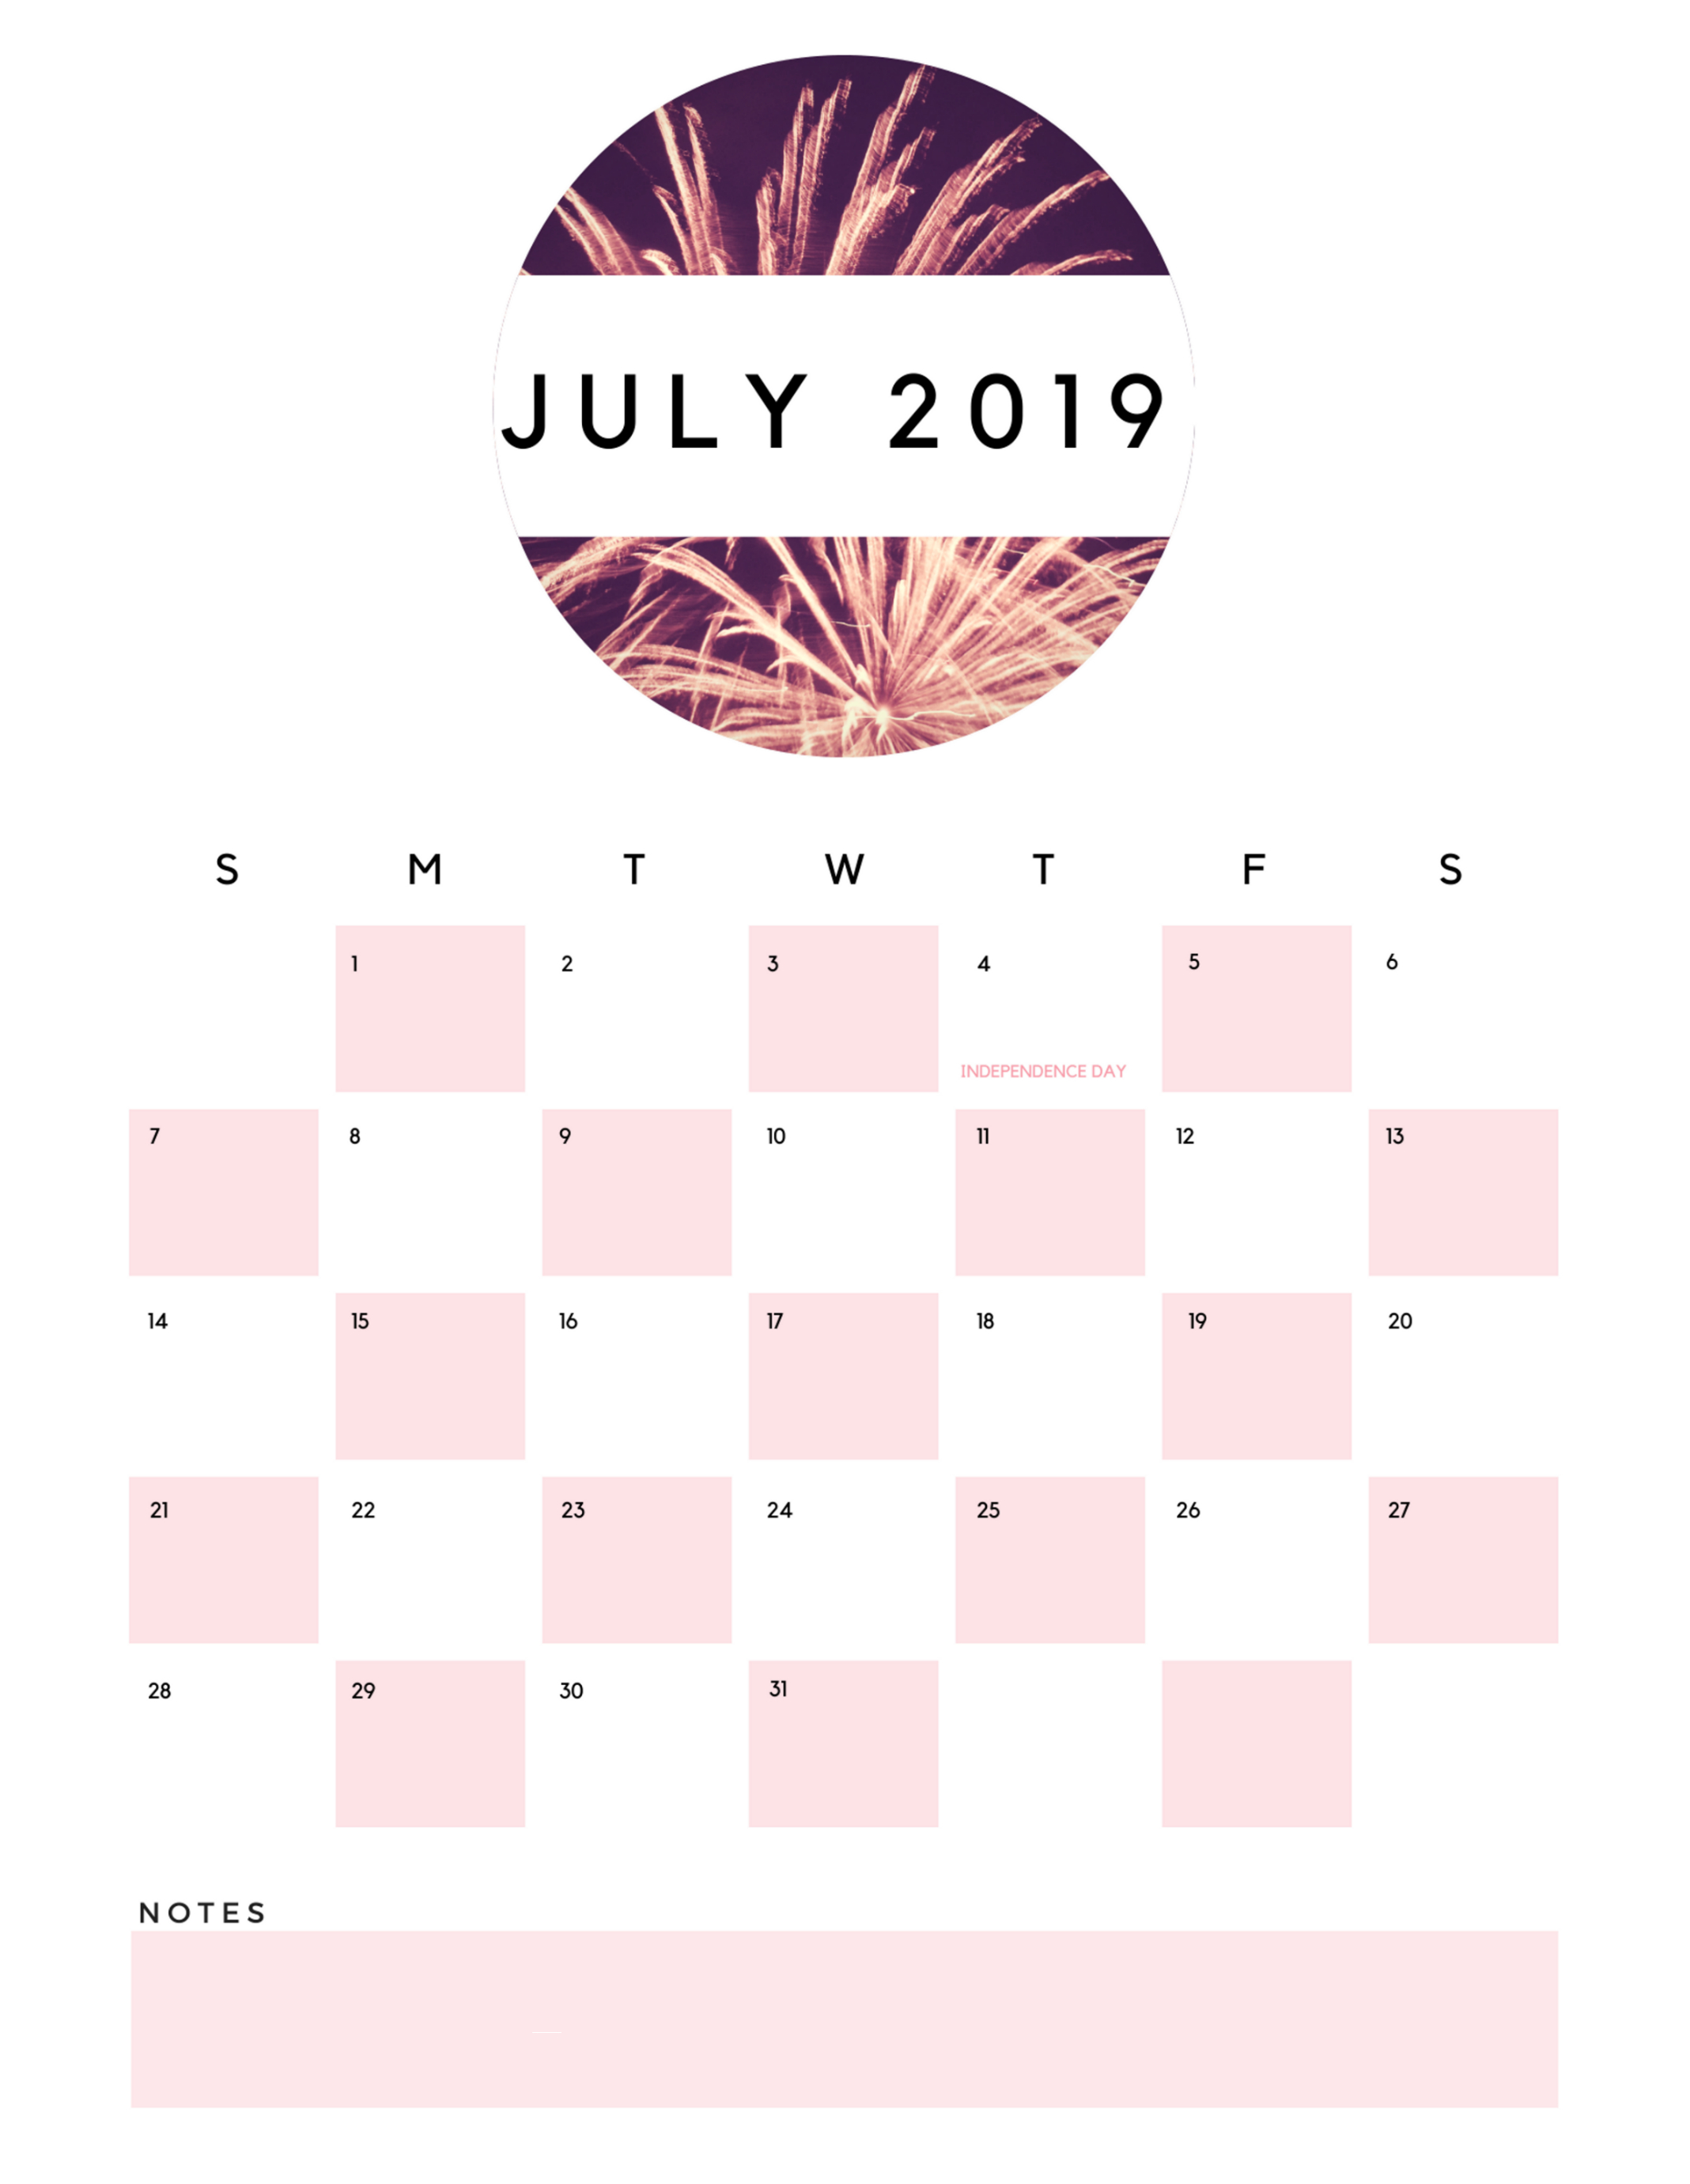 July 2019 Calendar | Calendar 2019 in Cute July Calendar Template